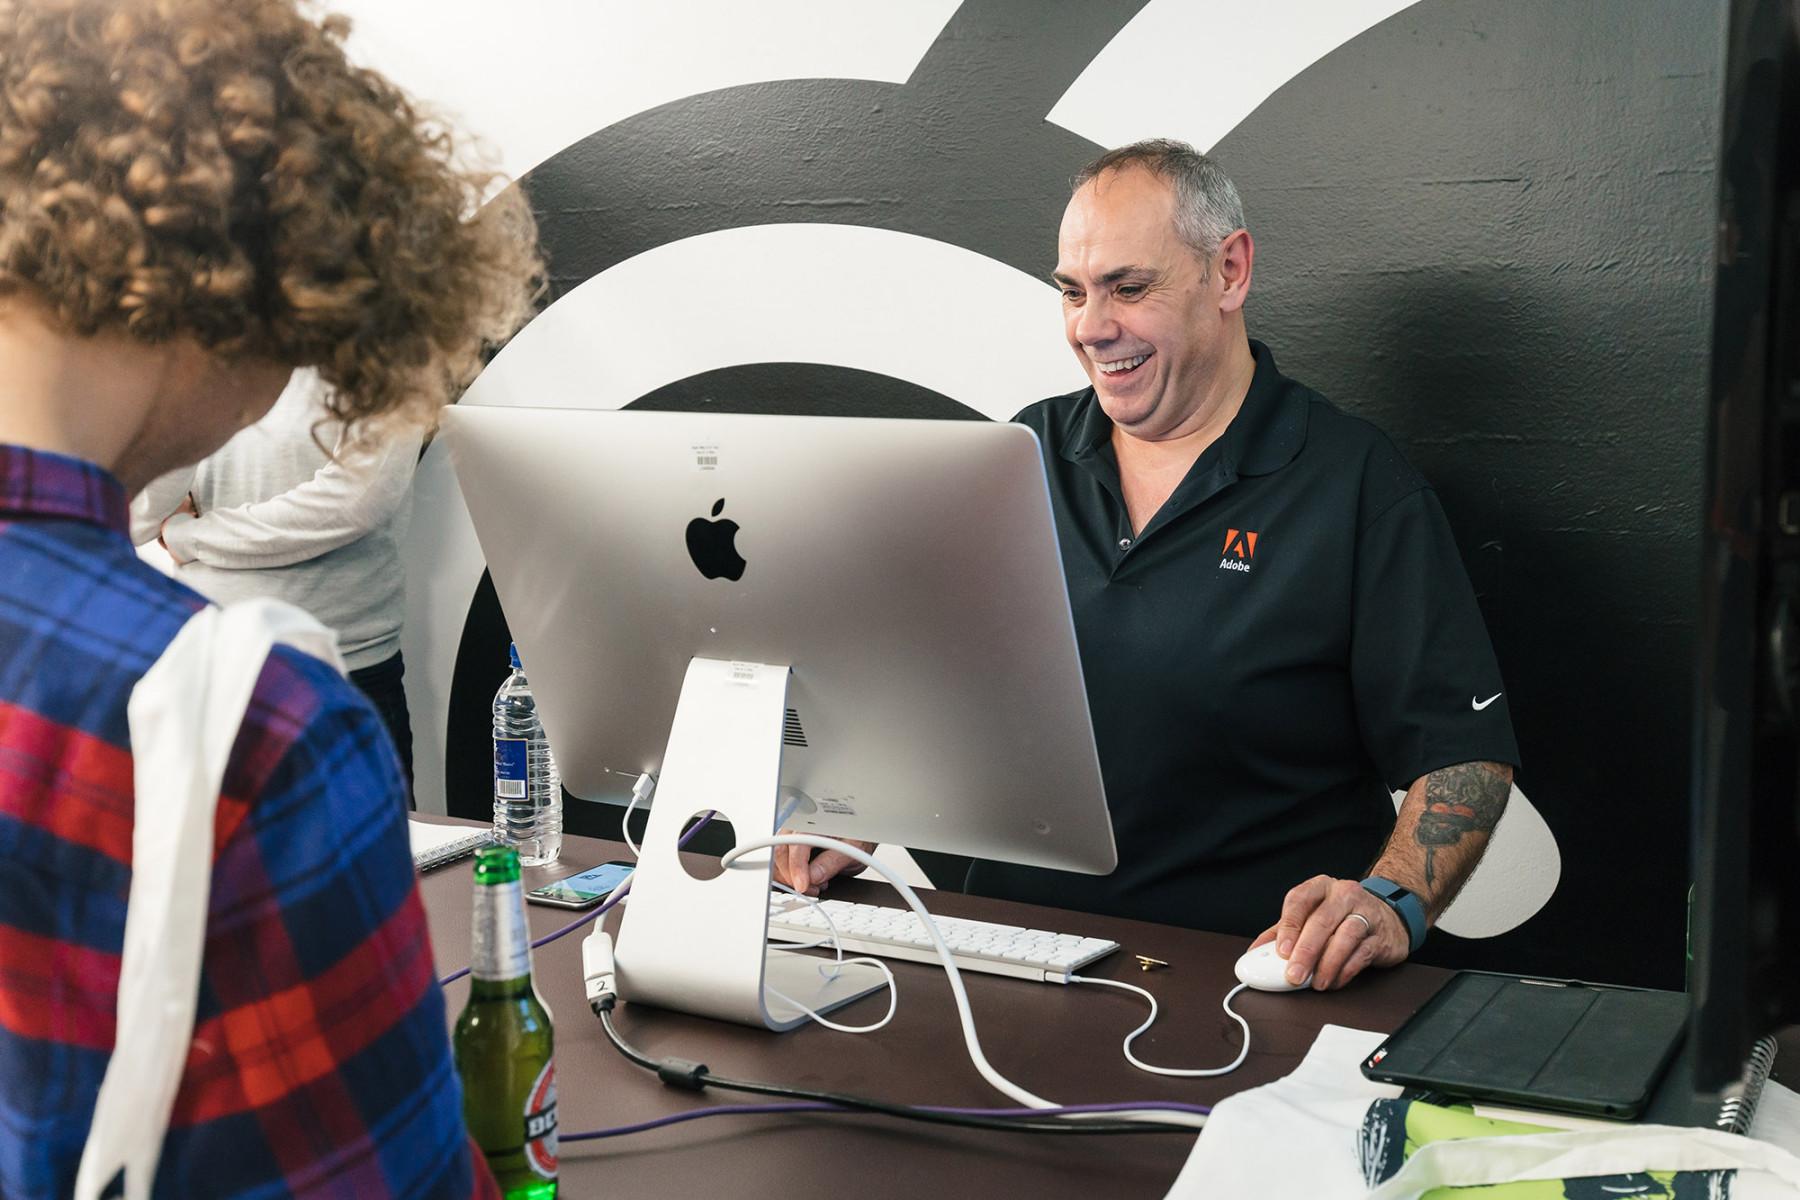 Adobe Creative Cloud Event Tony on Photoshop